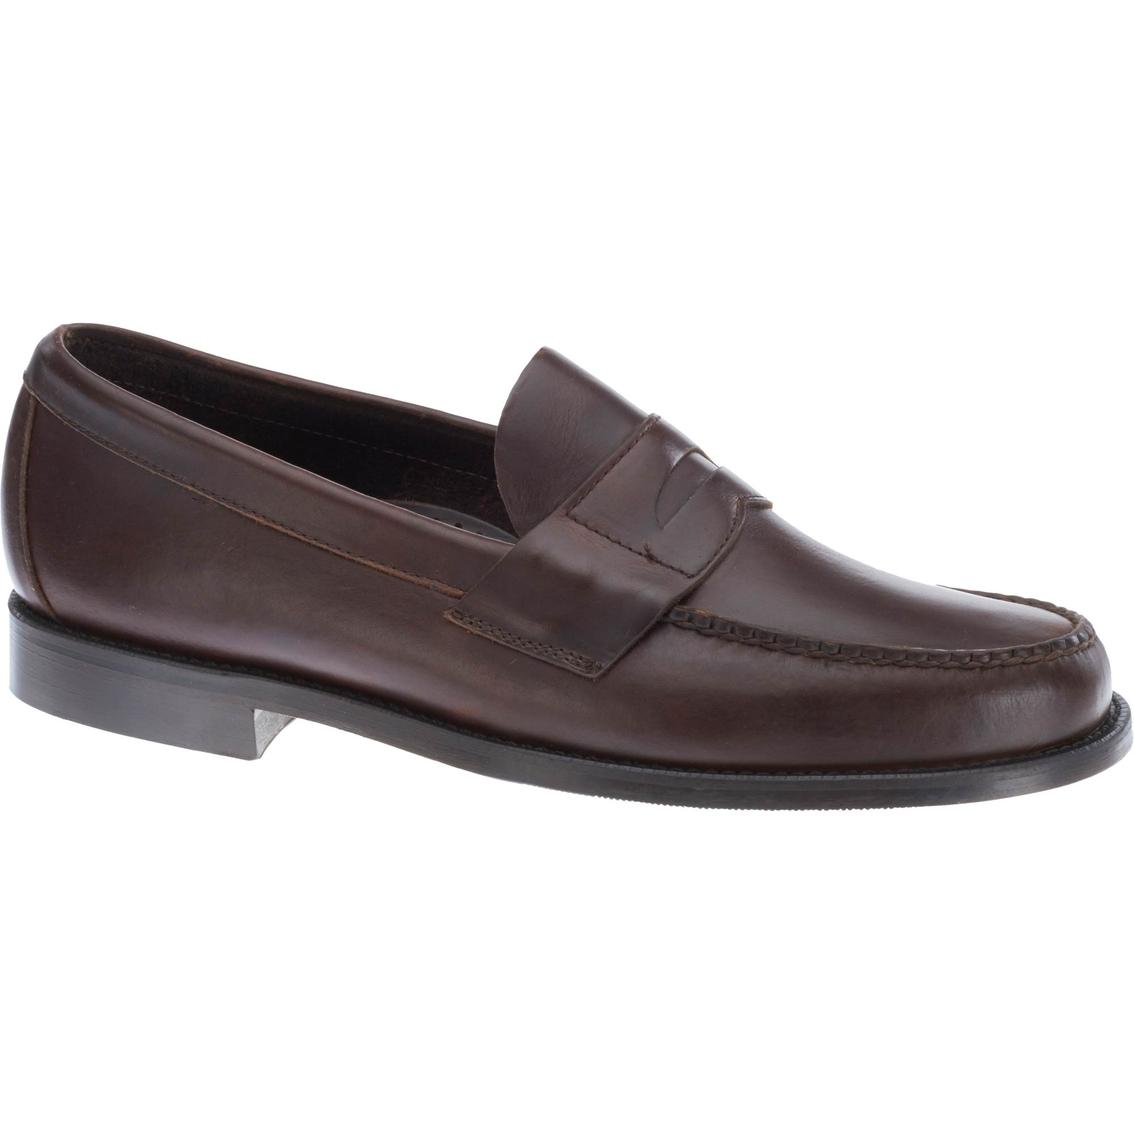 844498d200d Sebago Men s Heritage Penny Leather Slip On Penny Loafers